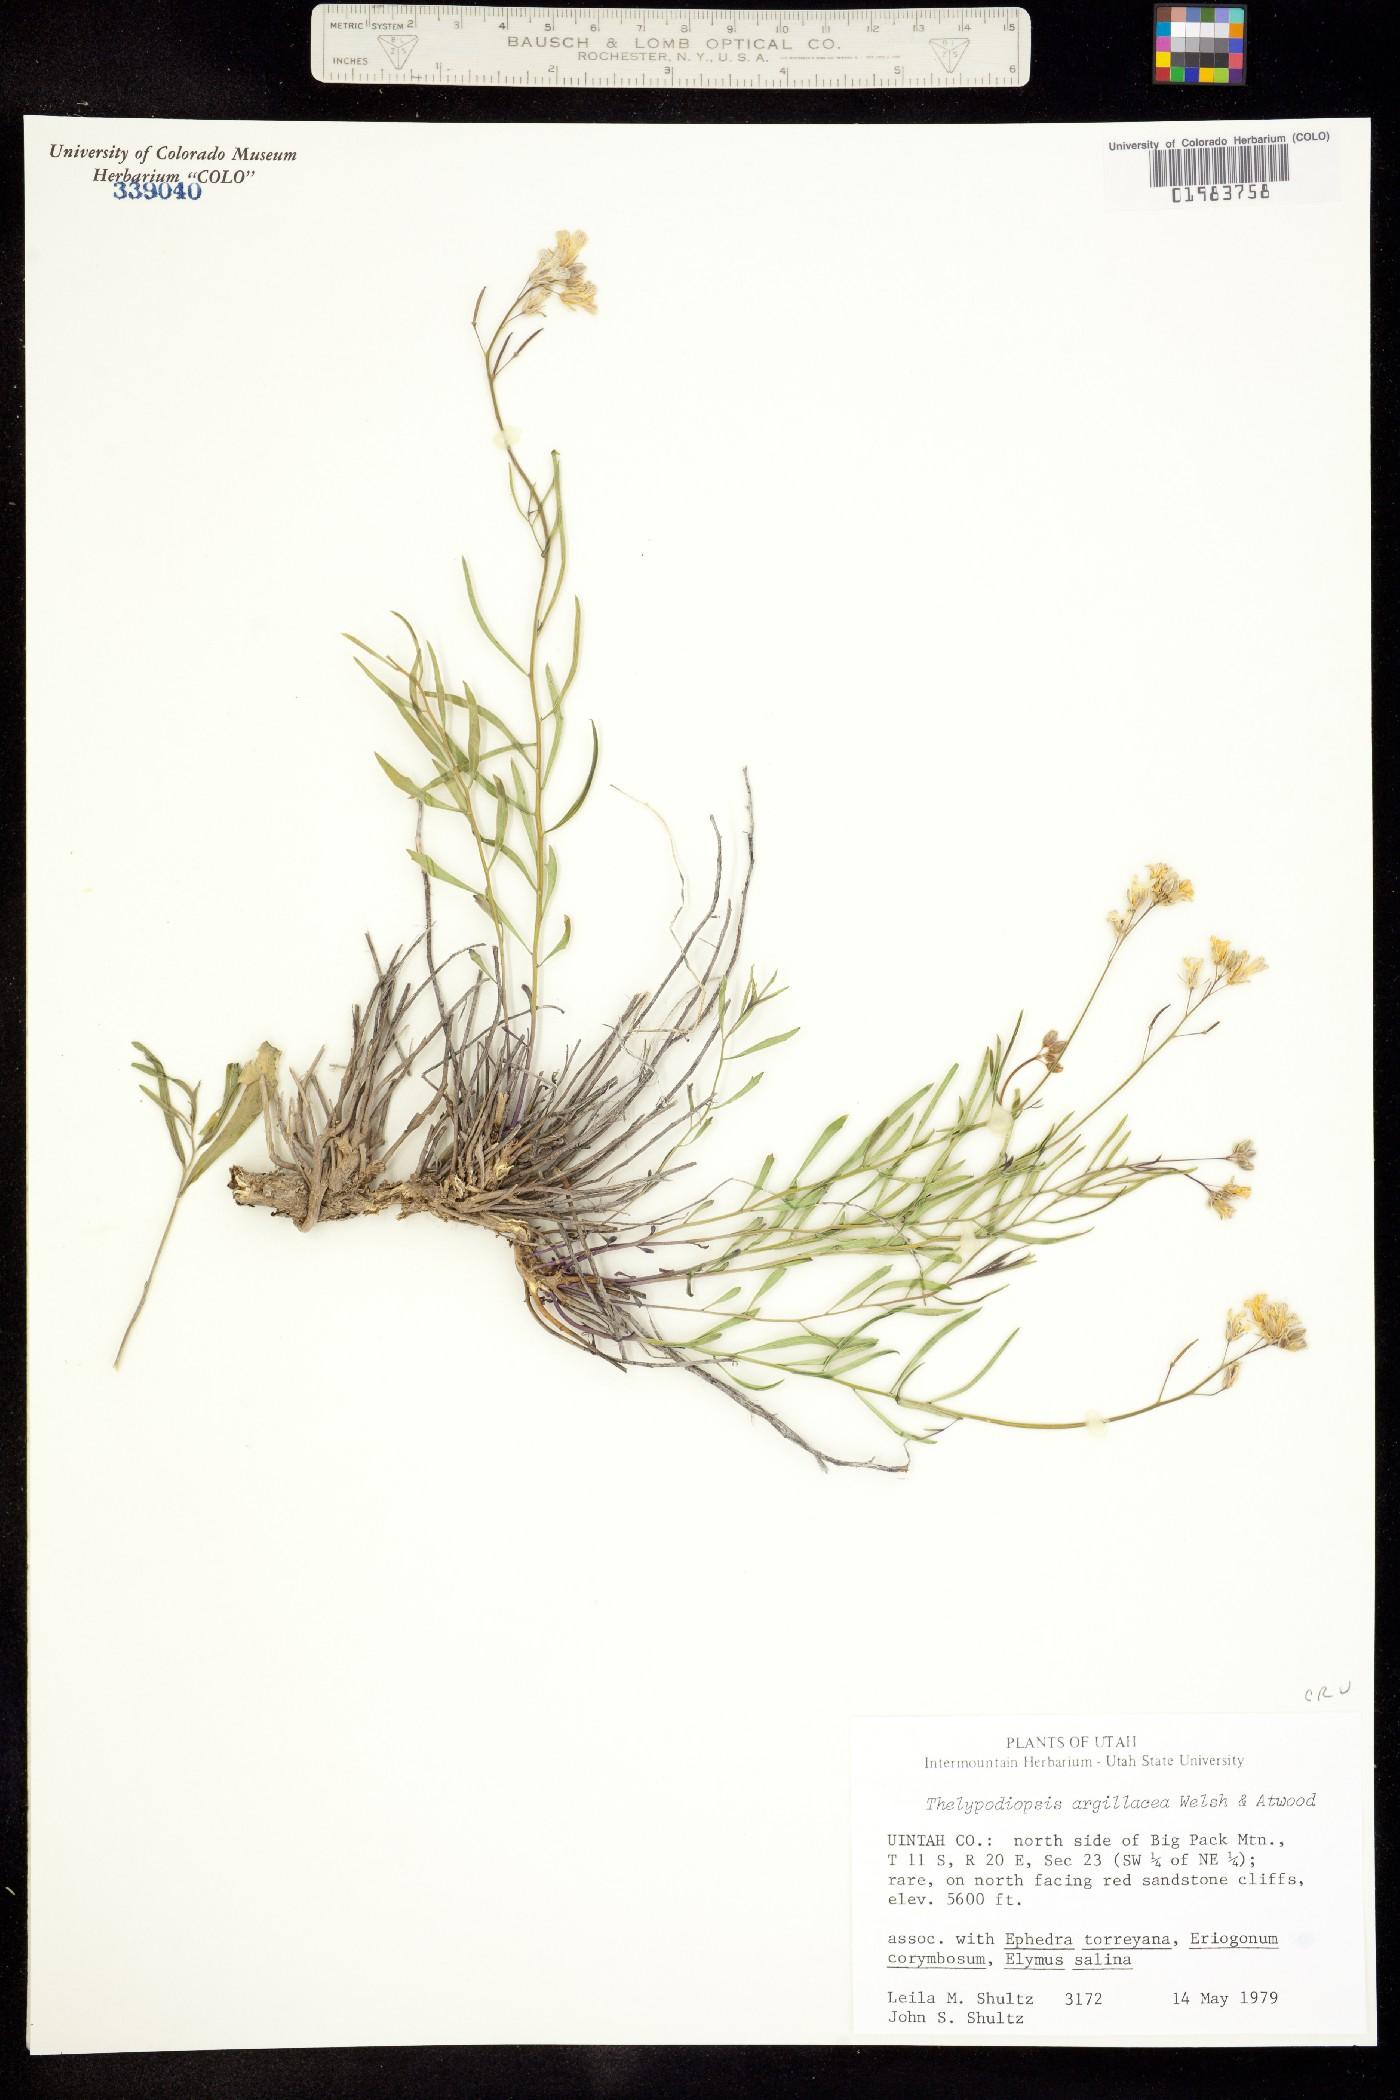 Thelypodiopsis argillacea image